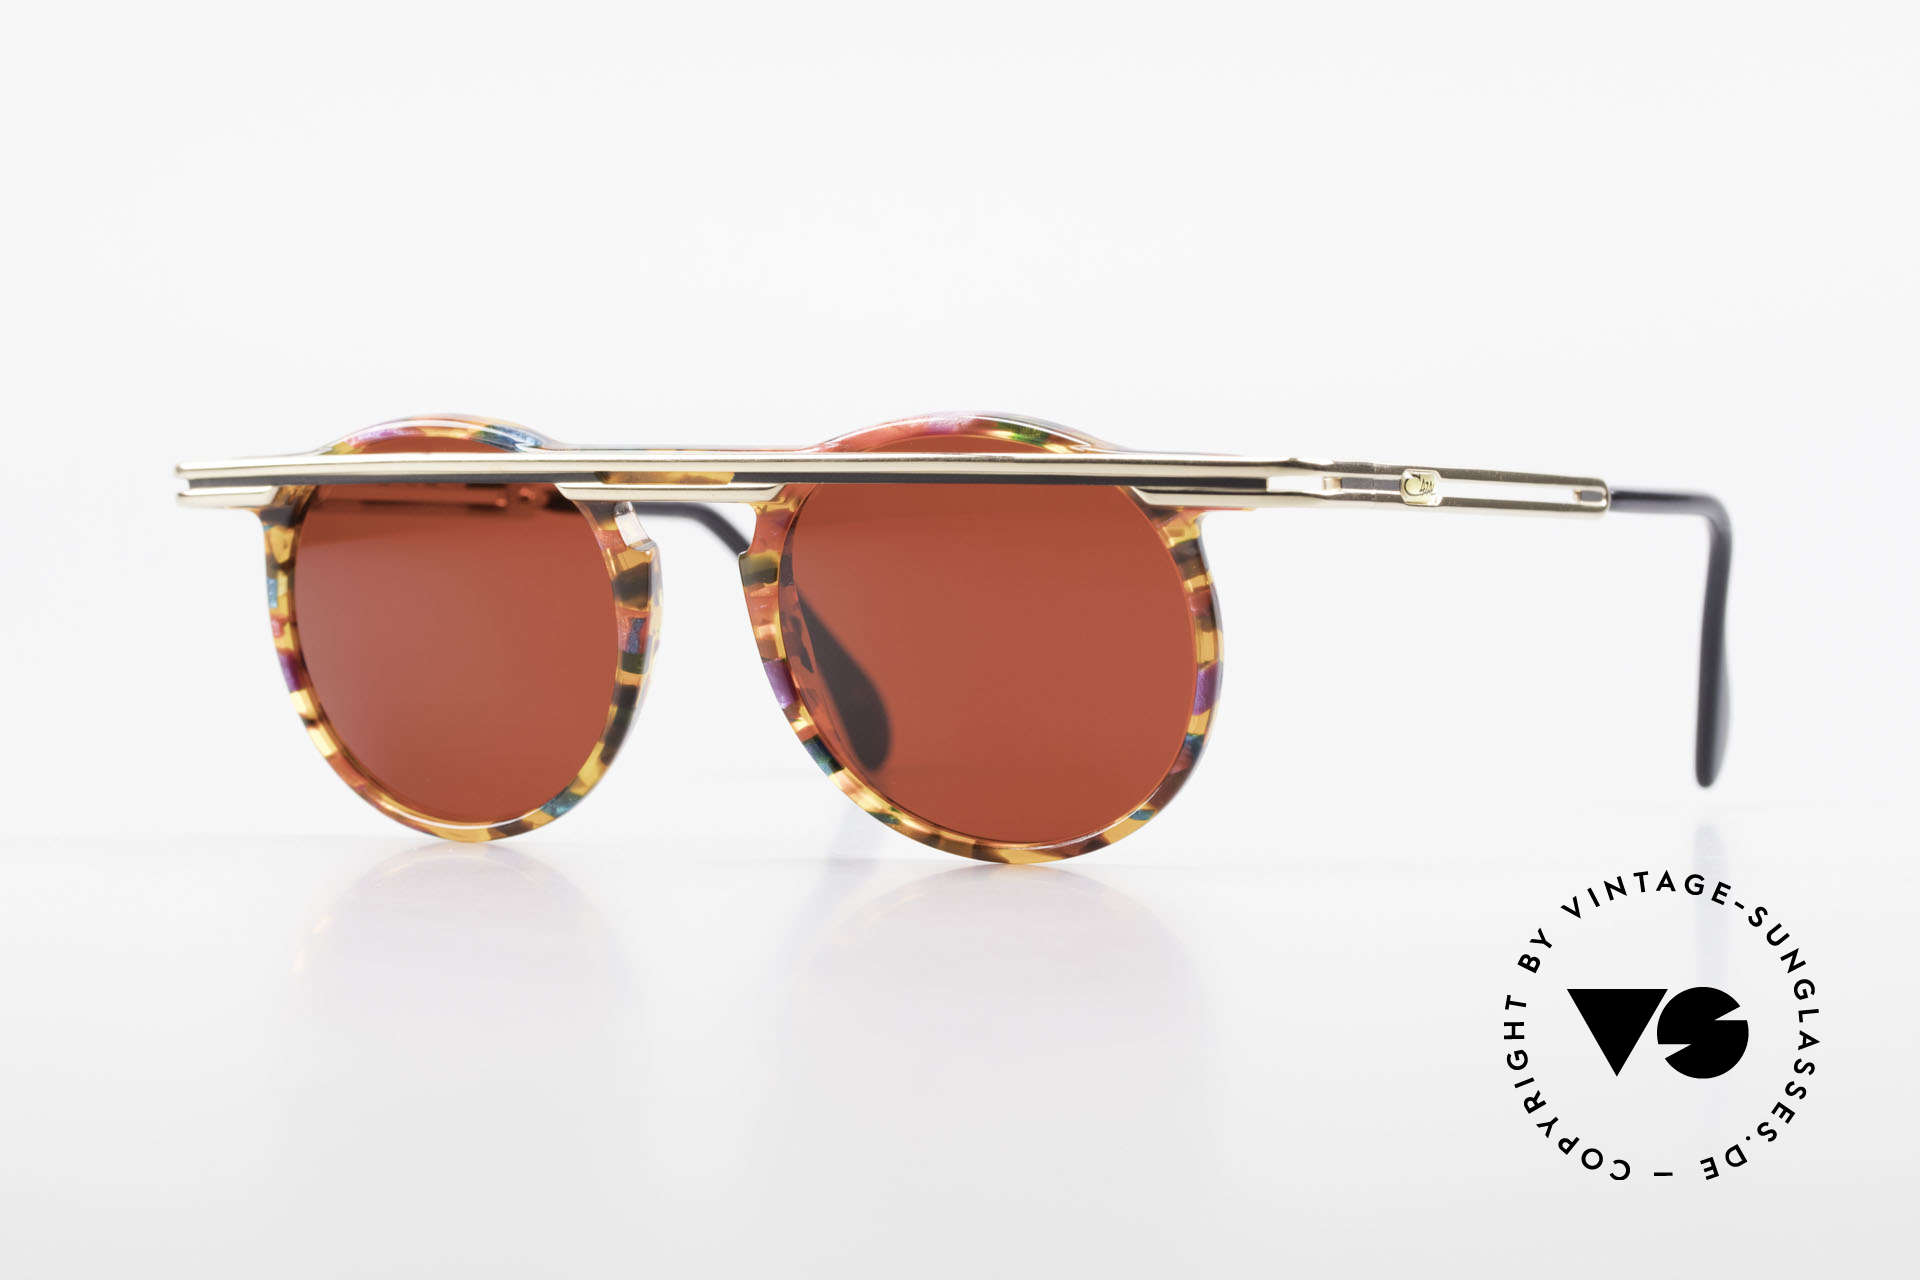 Cazal 648 Original Old Cazal Sunglasses, extraordinary CAZAL vintage sunglasses from 1990, Made for Men and Women